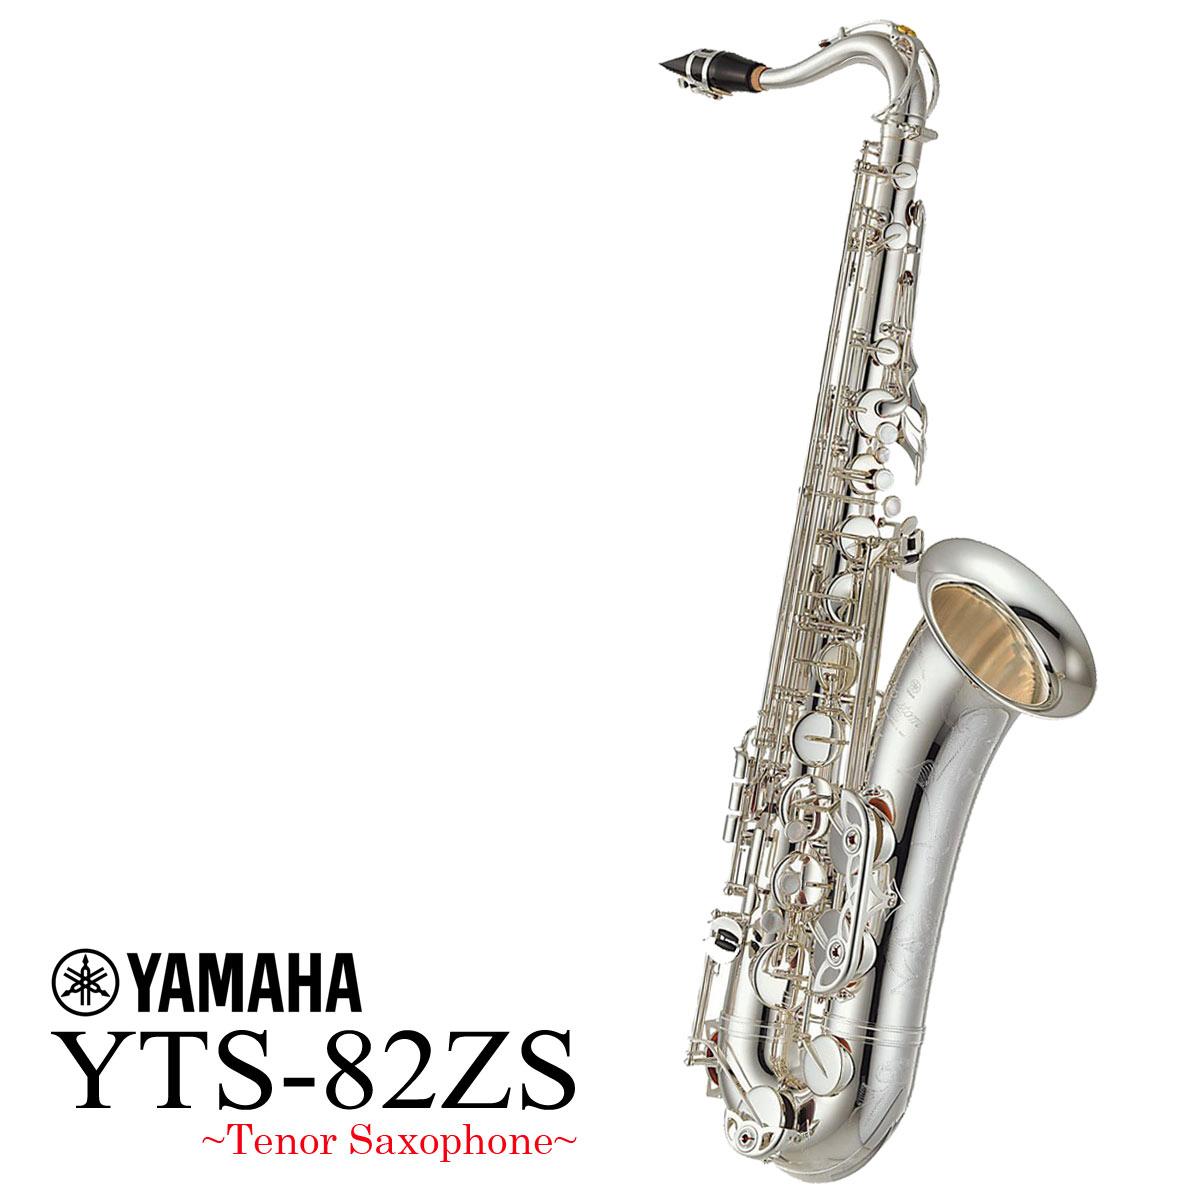 YAMAHA / YTS-82ZS カスタム テナーサックス 銀メッキ シルバー 《受注生産品/納期約3~4ヶ月》《出荷前検品付き》【5年保証】